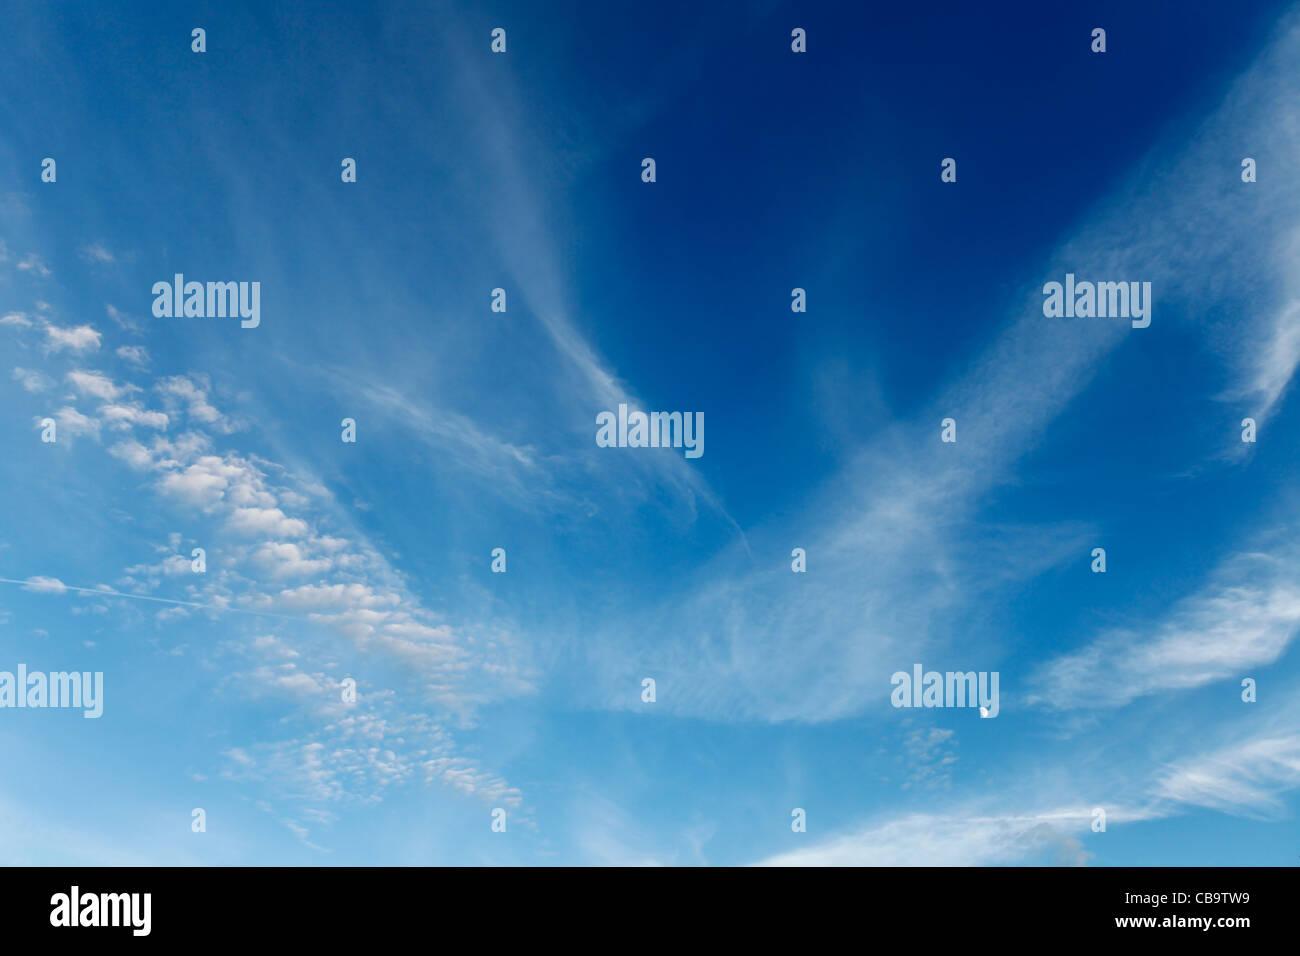 Wispy cloud in summer sky - Stock Image